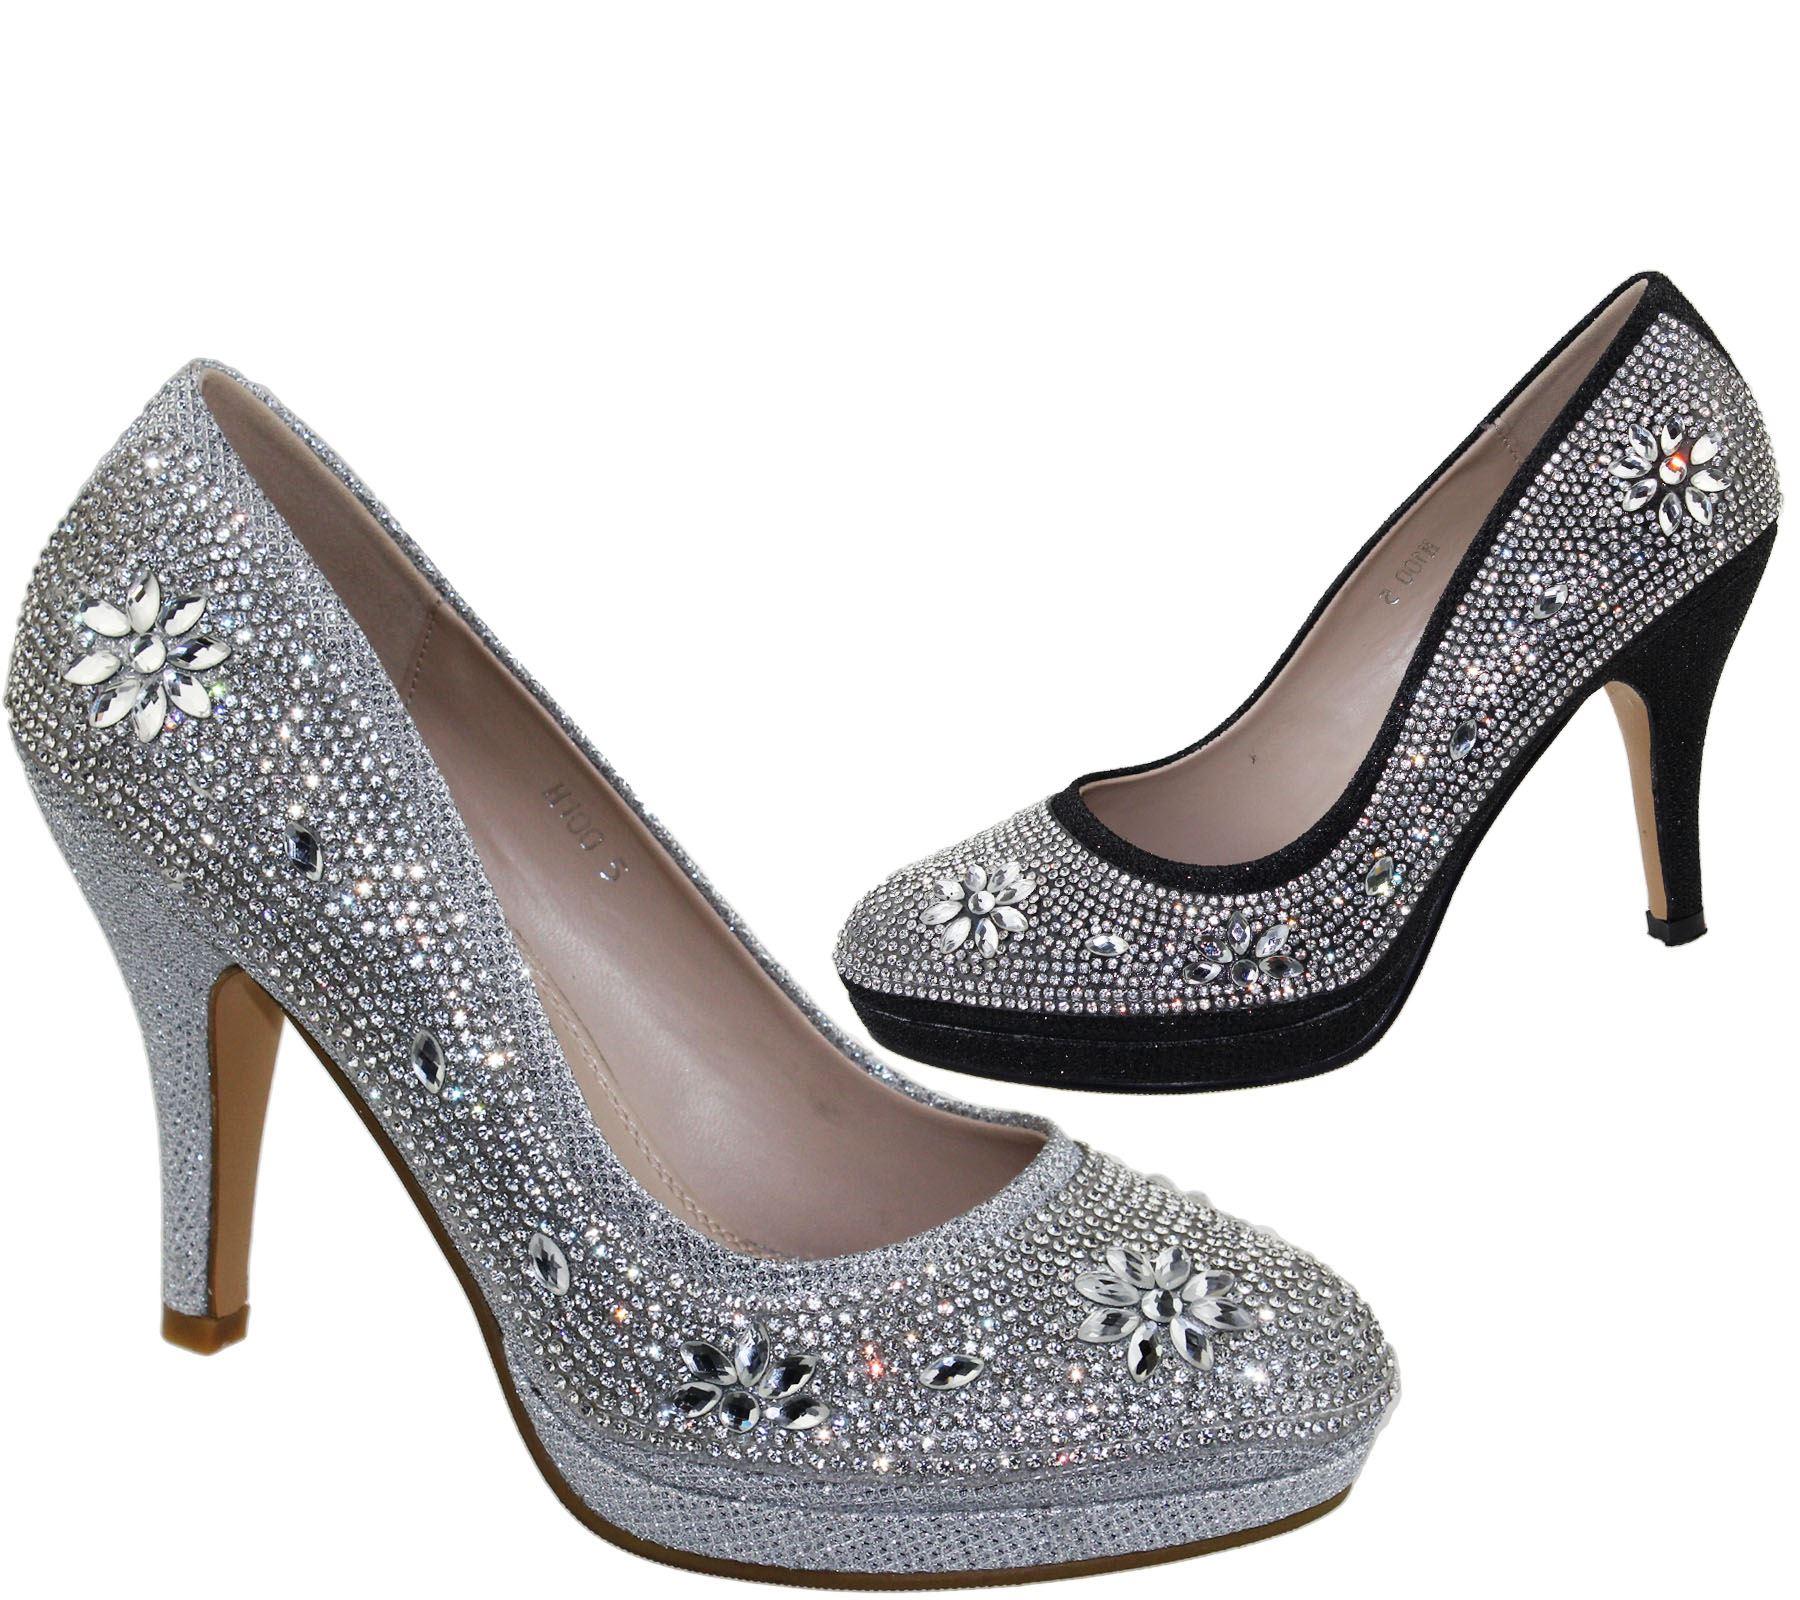 Womens-Platforms-High-Heels-Wedding-Bridal-Evening-Diamante-Ladies-Party-Shoes miniatura 25